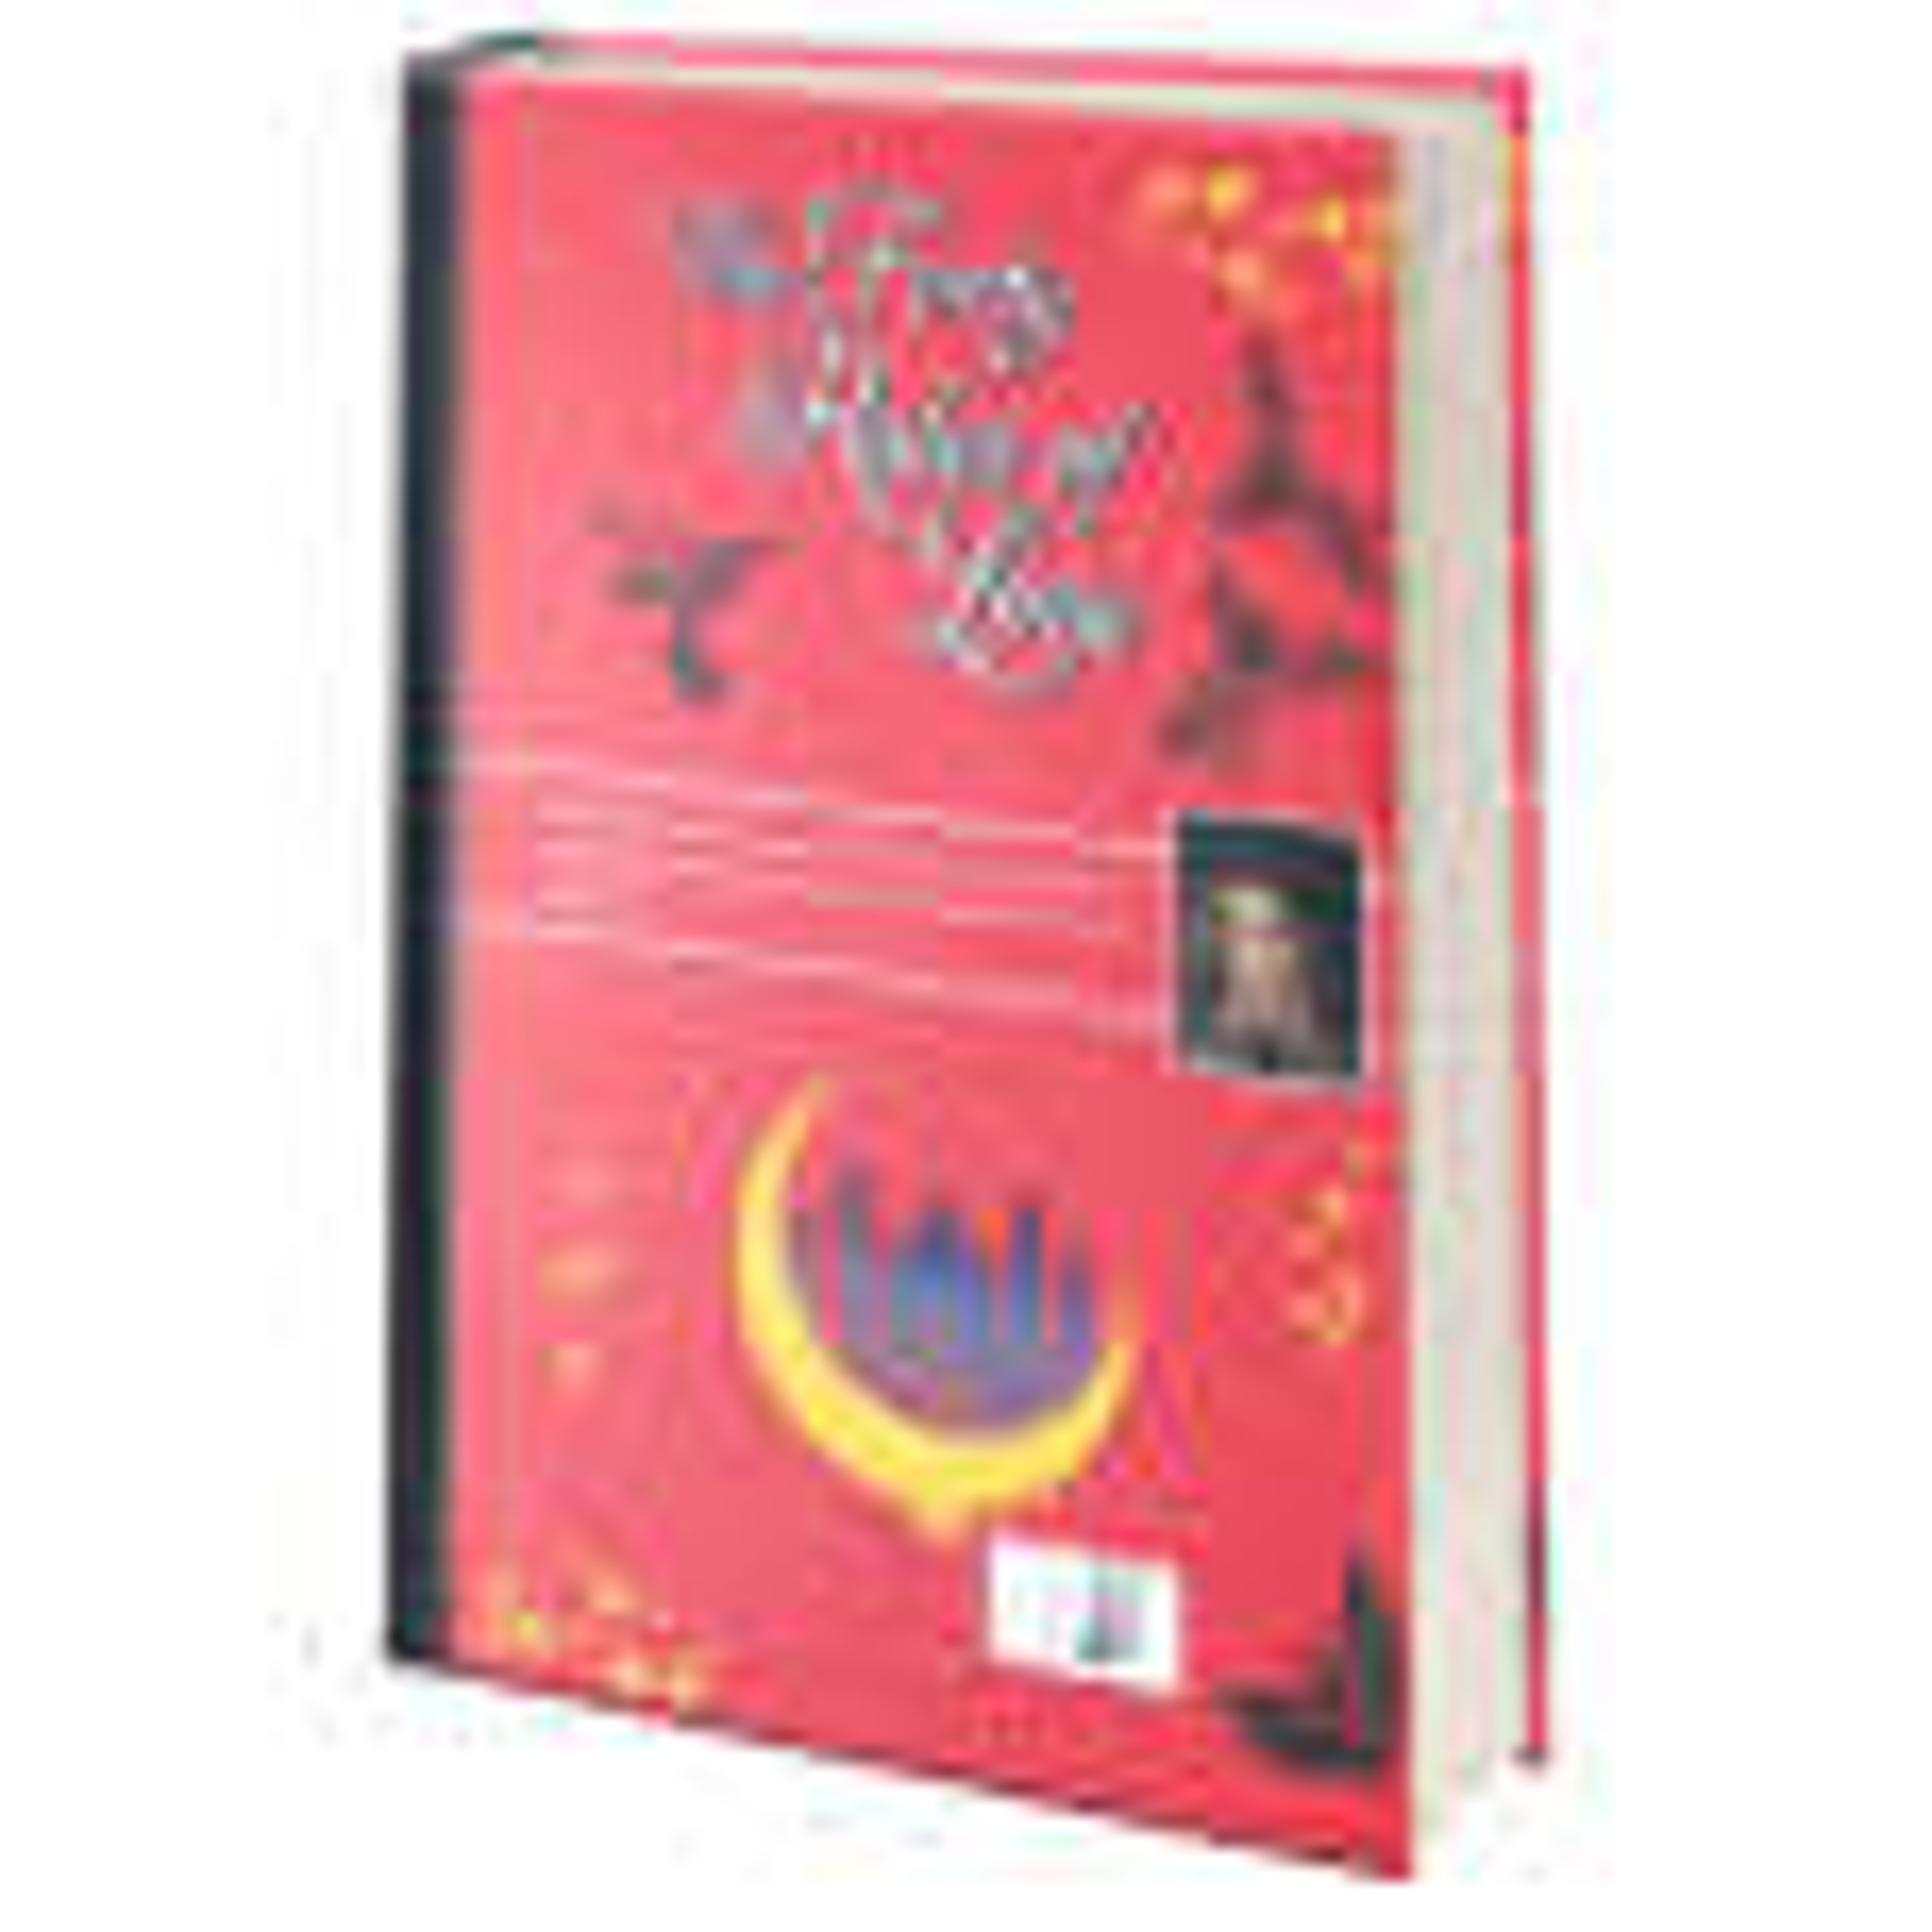 کتاب ملت عشق اثر الیف شافاک نشر آتیسا thumb 1